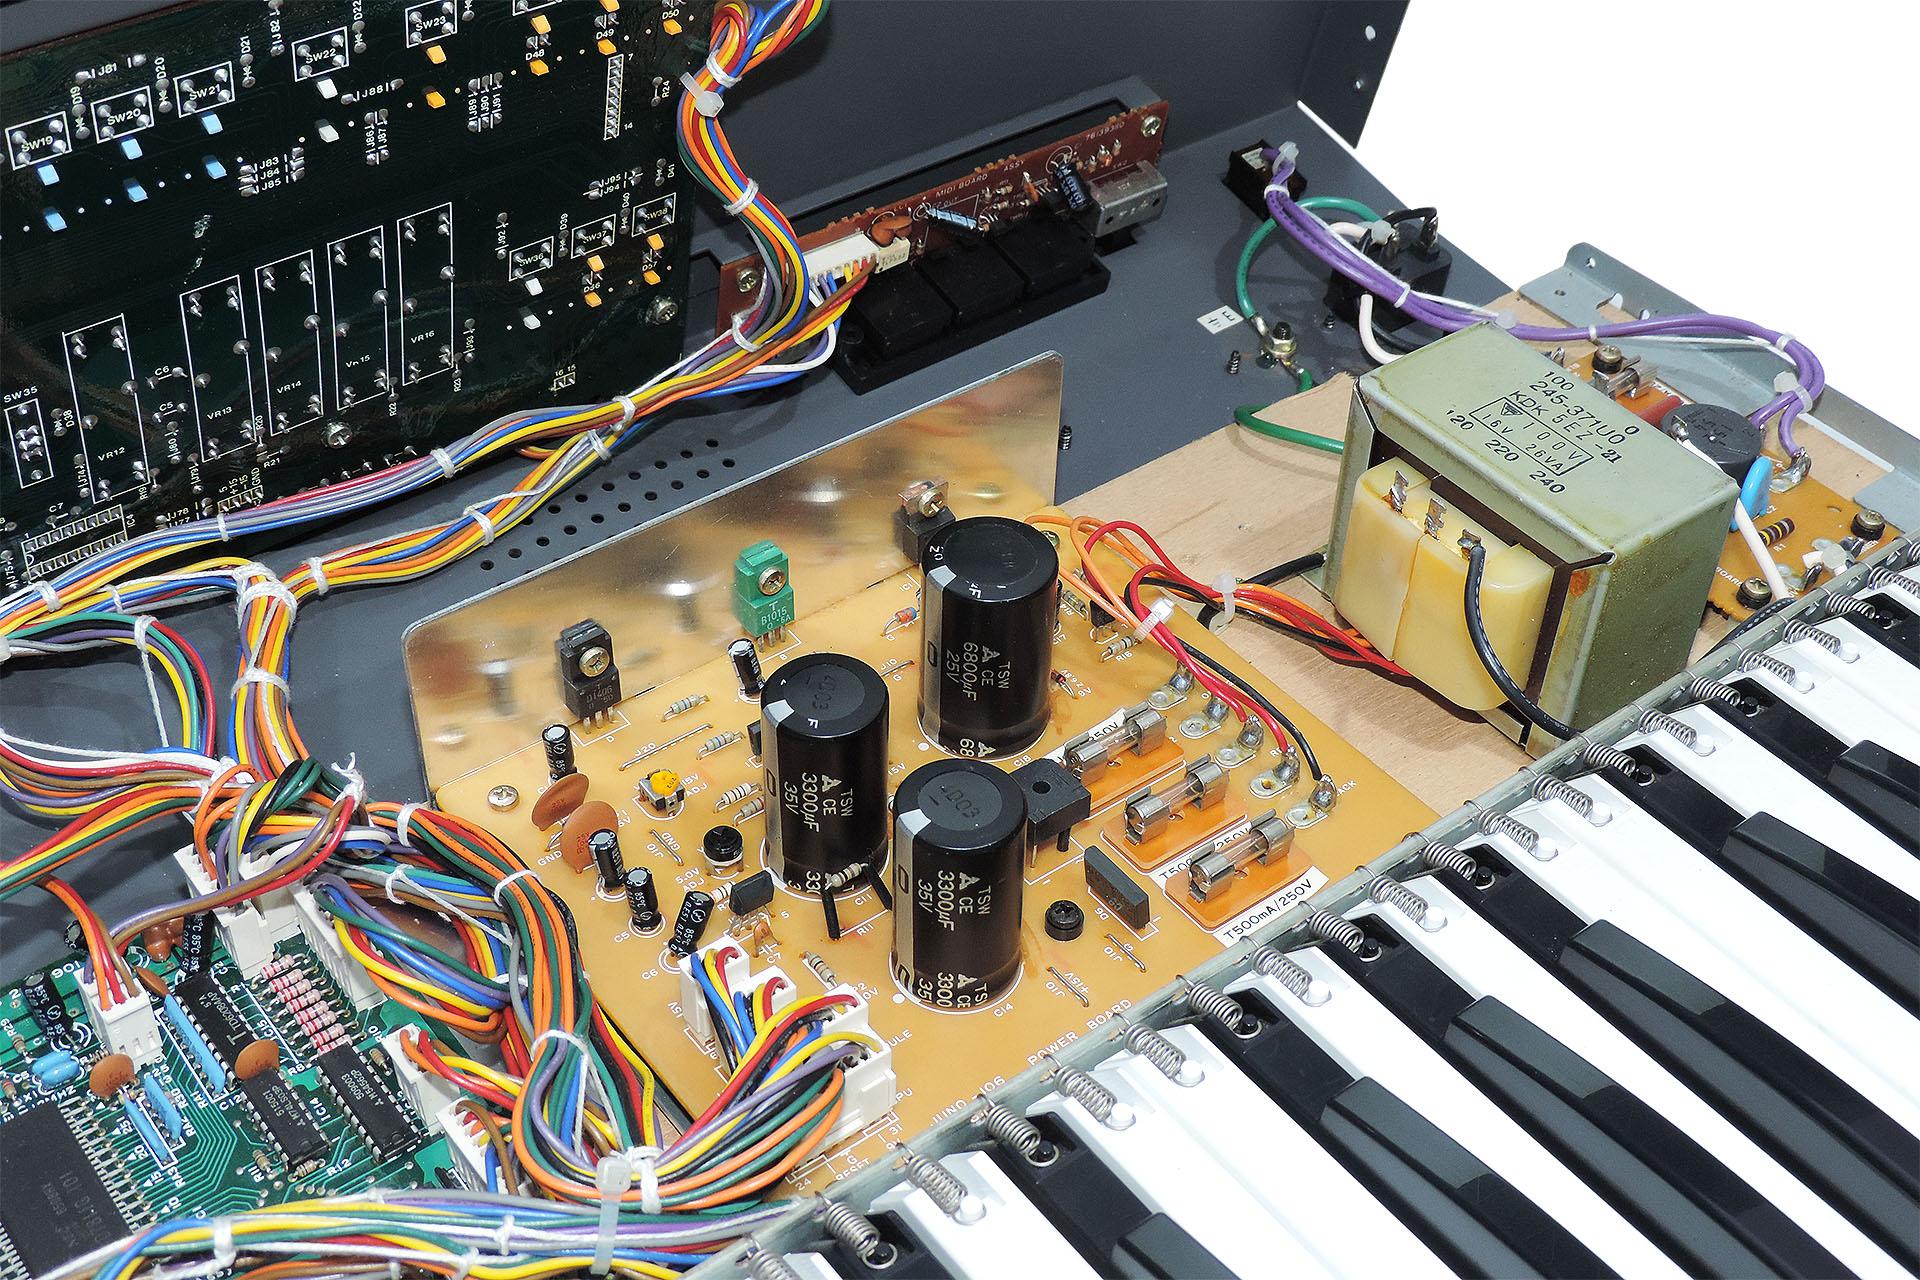 Roland Juno-106 power supply